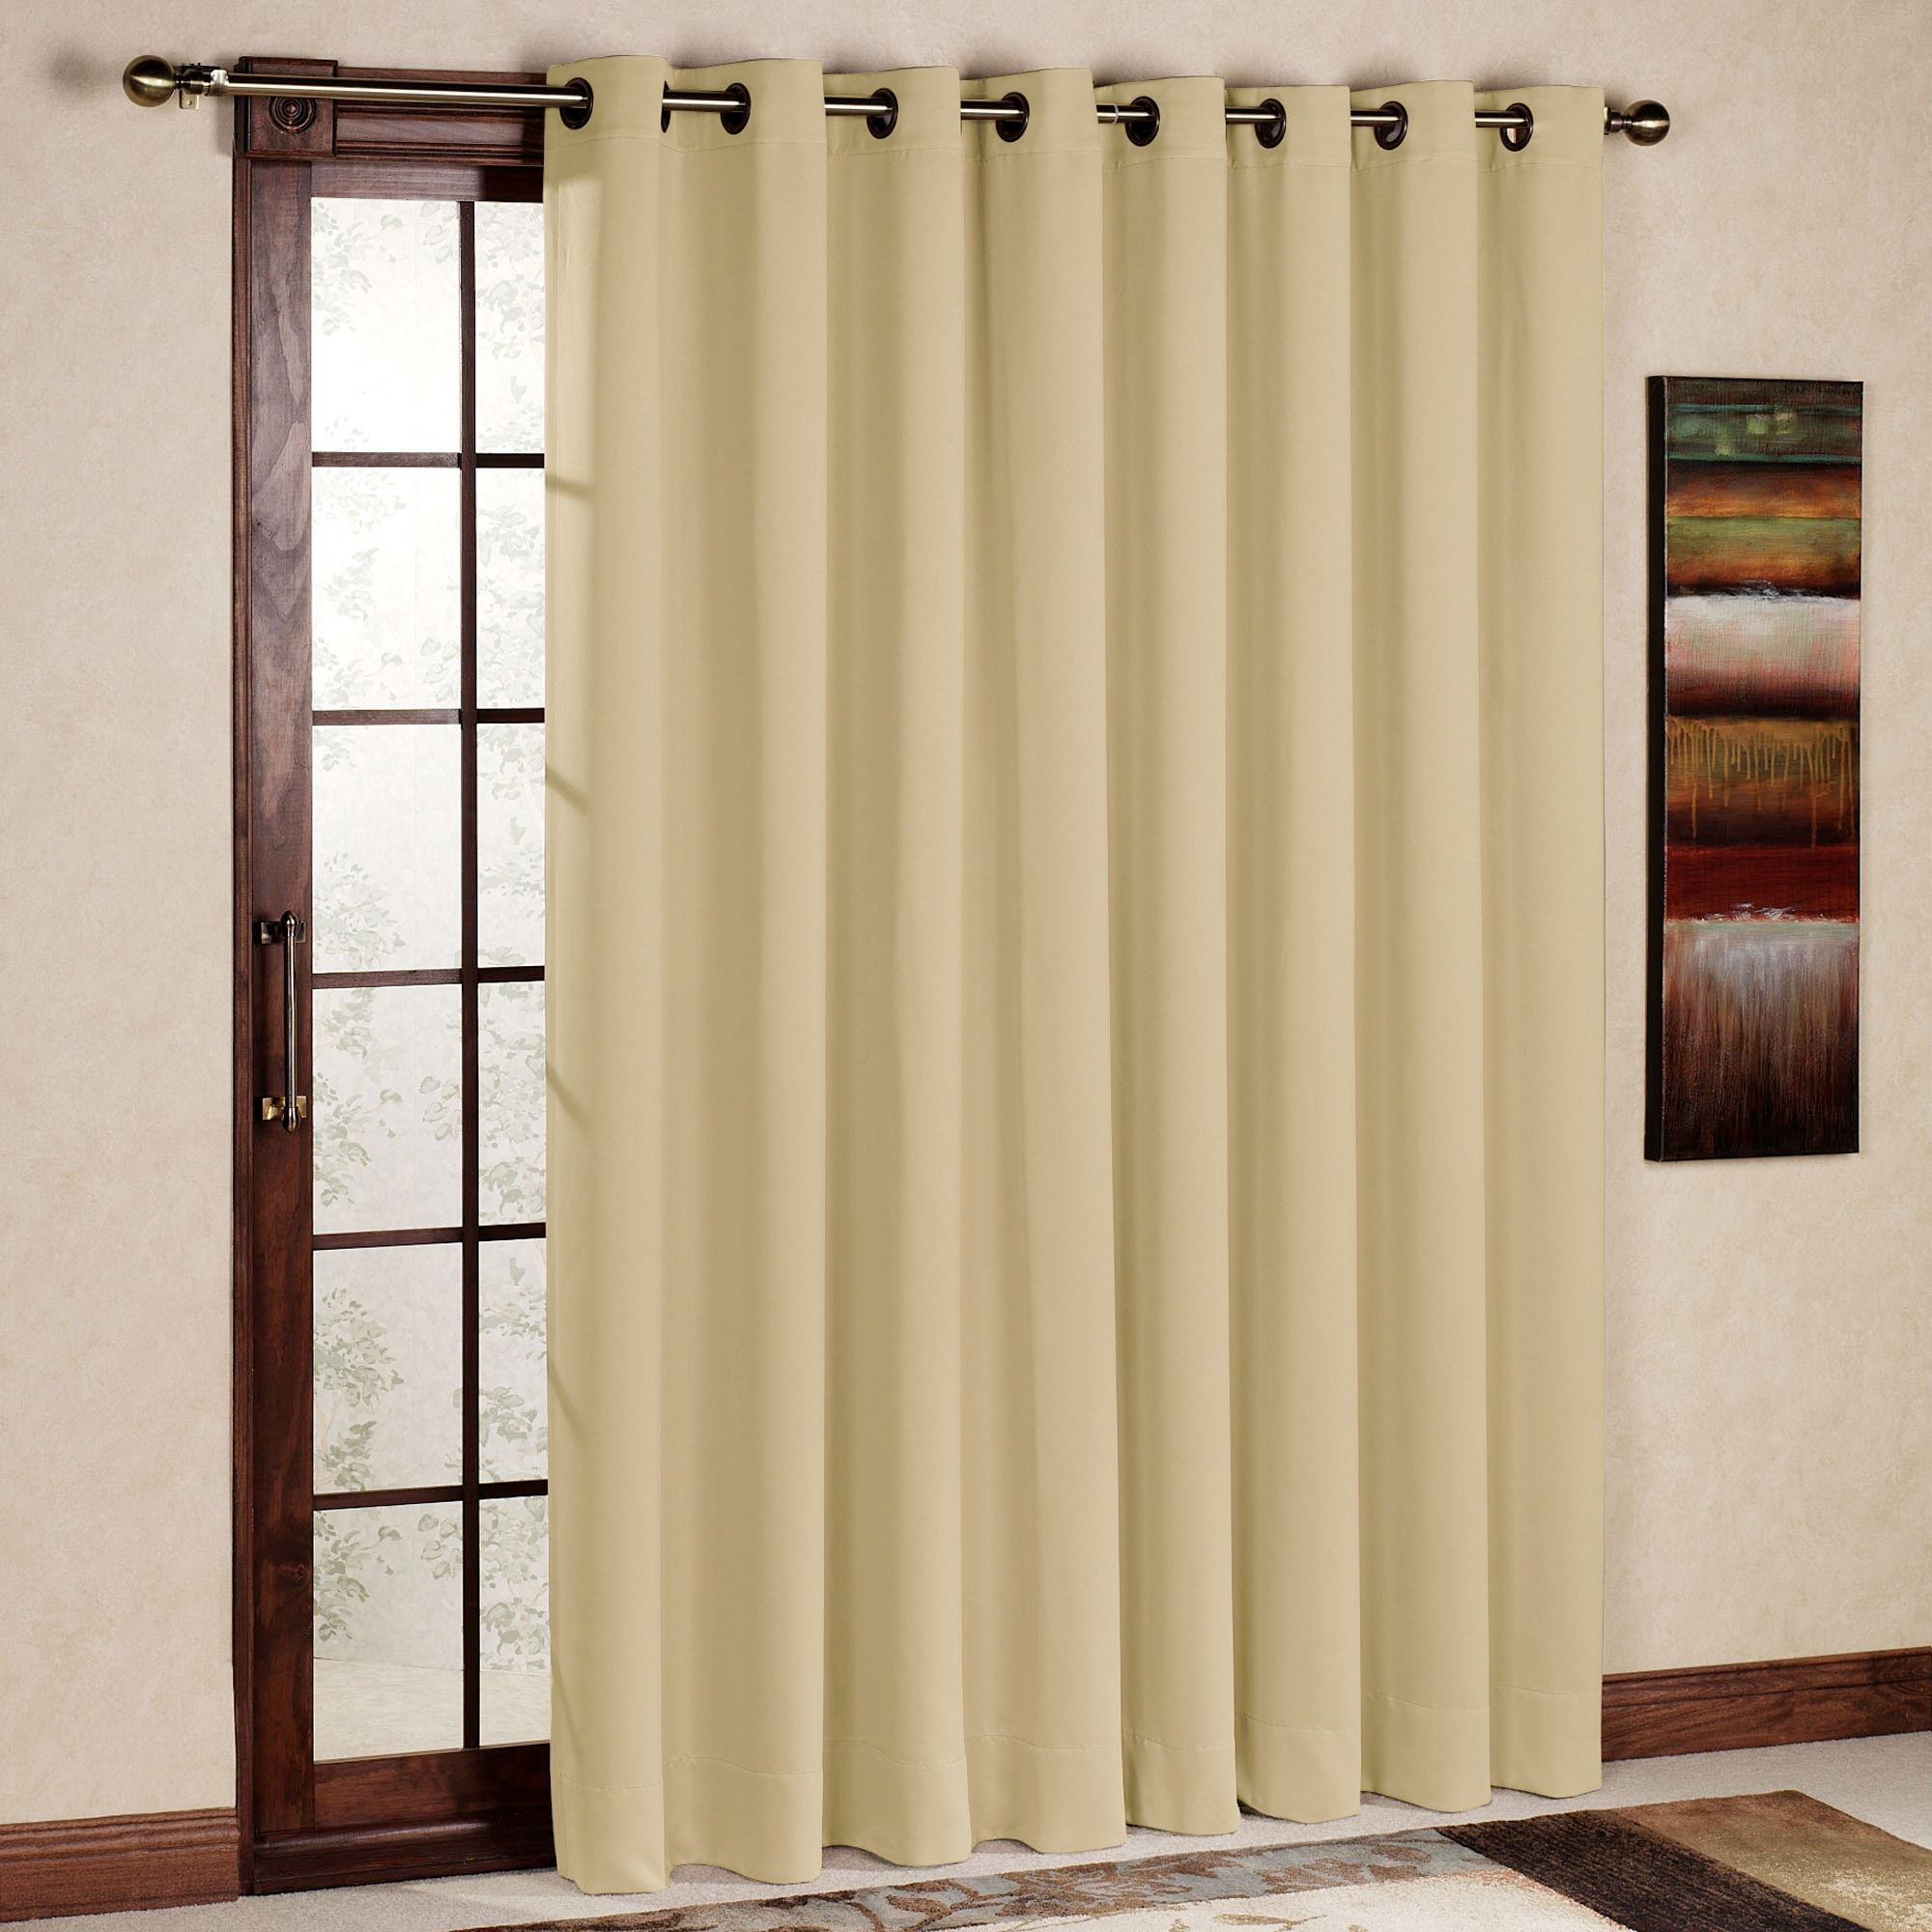 Rhf Wide Thermal Blackout Patio Door Curtain Panel Sliding Door